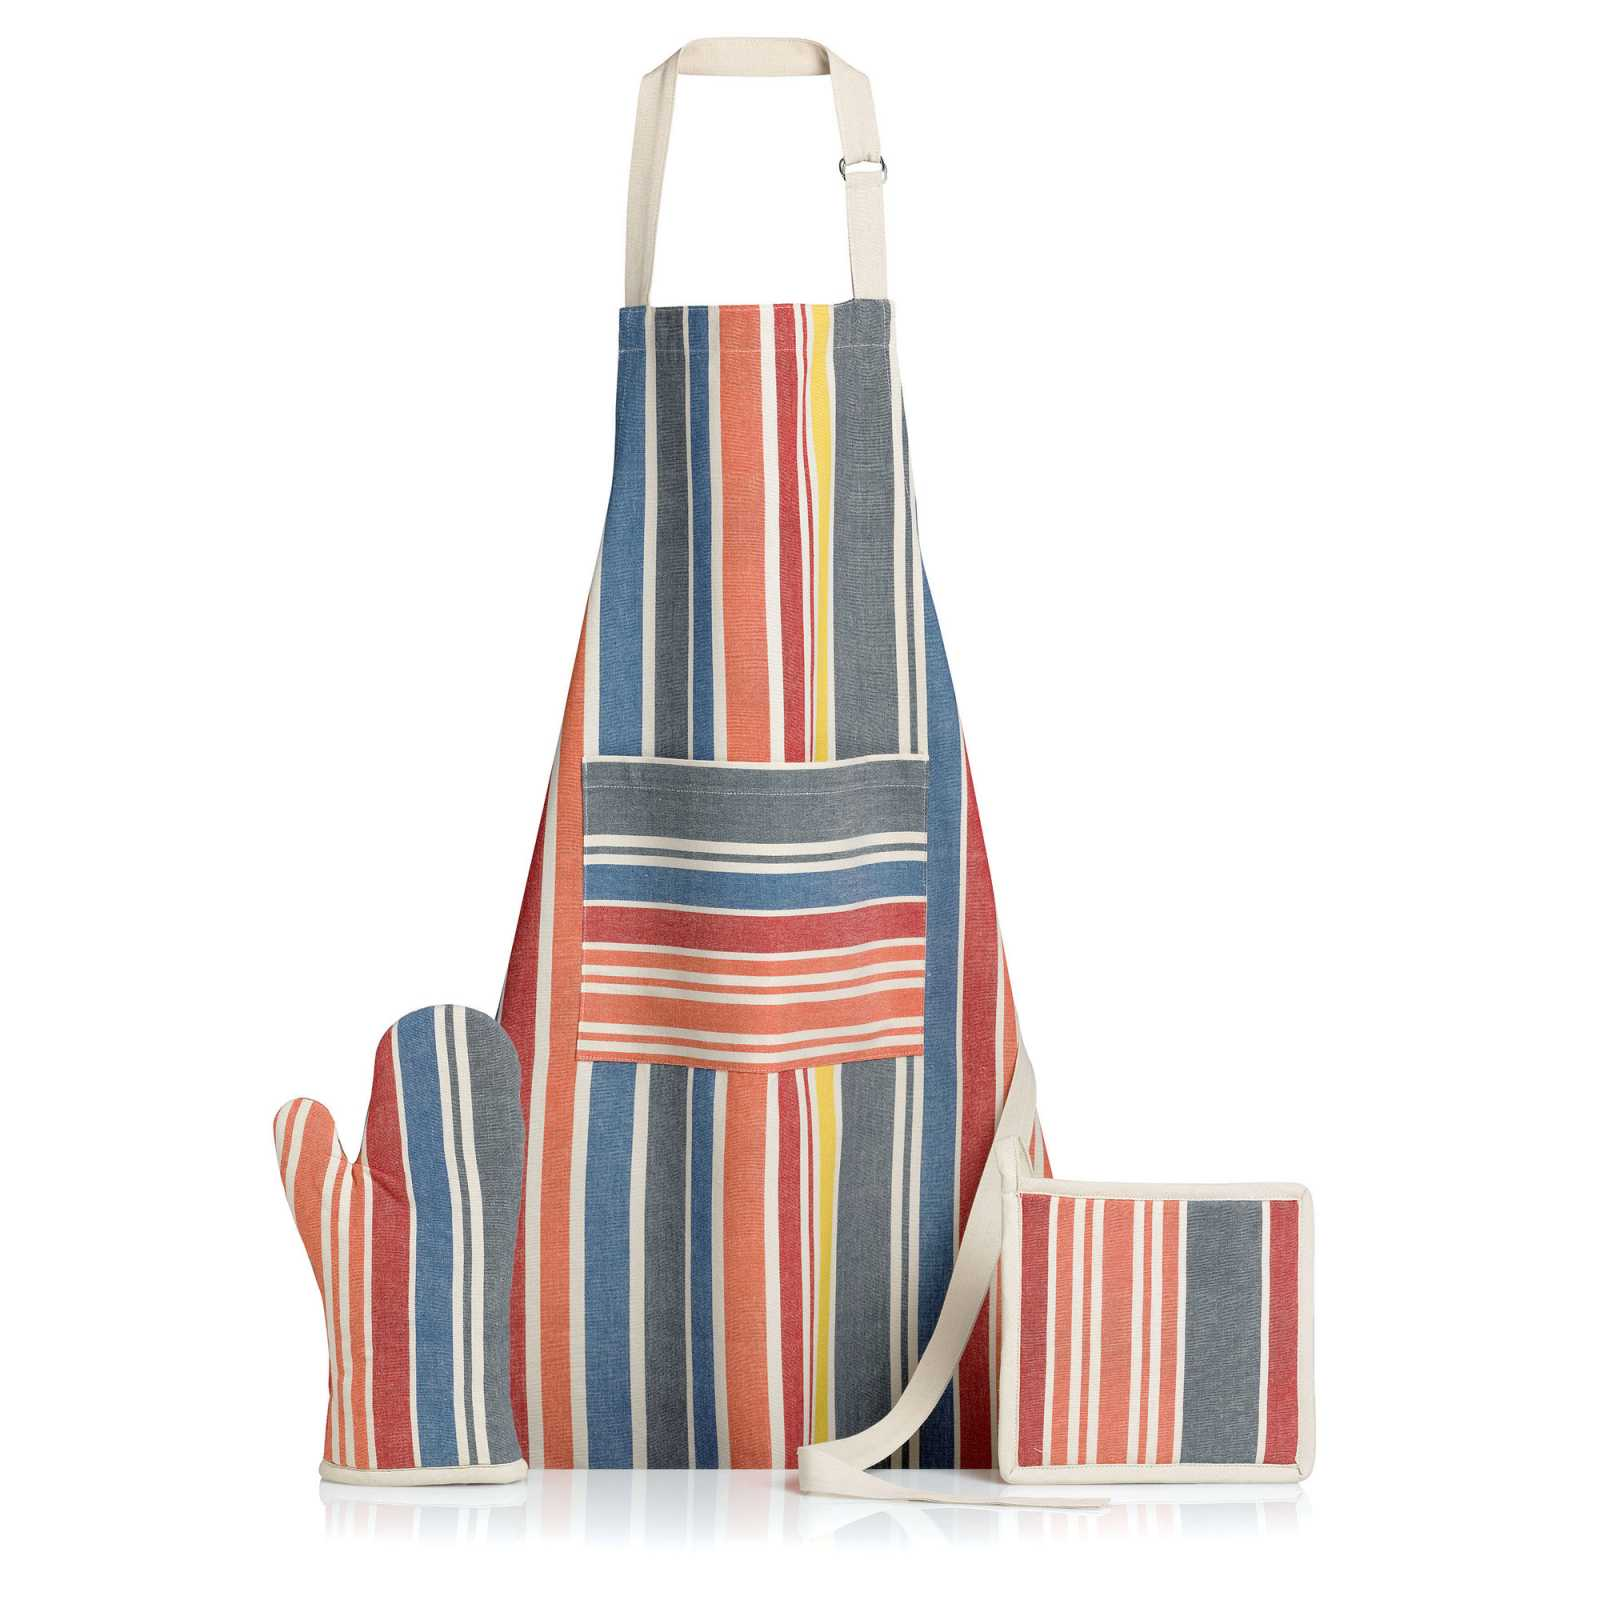 Прихватка кухонная Winkler OFFIC, 20х20 см, разноцветный Winkler 1593750000 фото 2